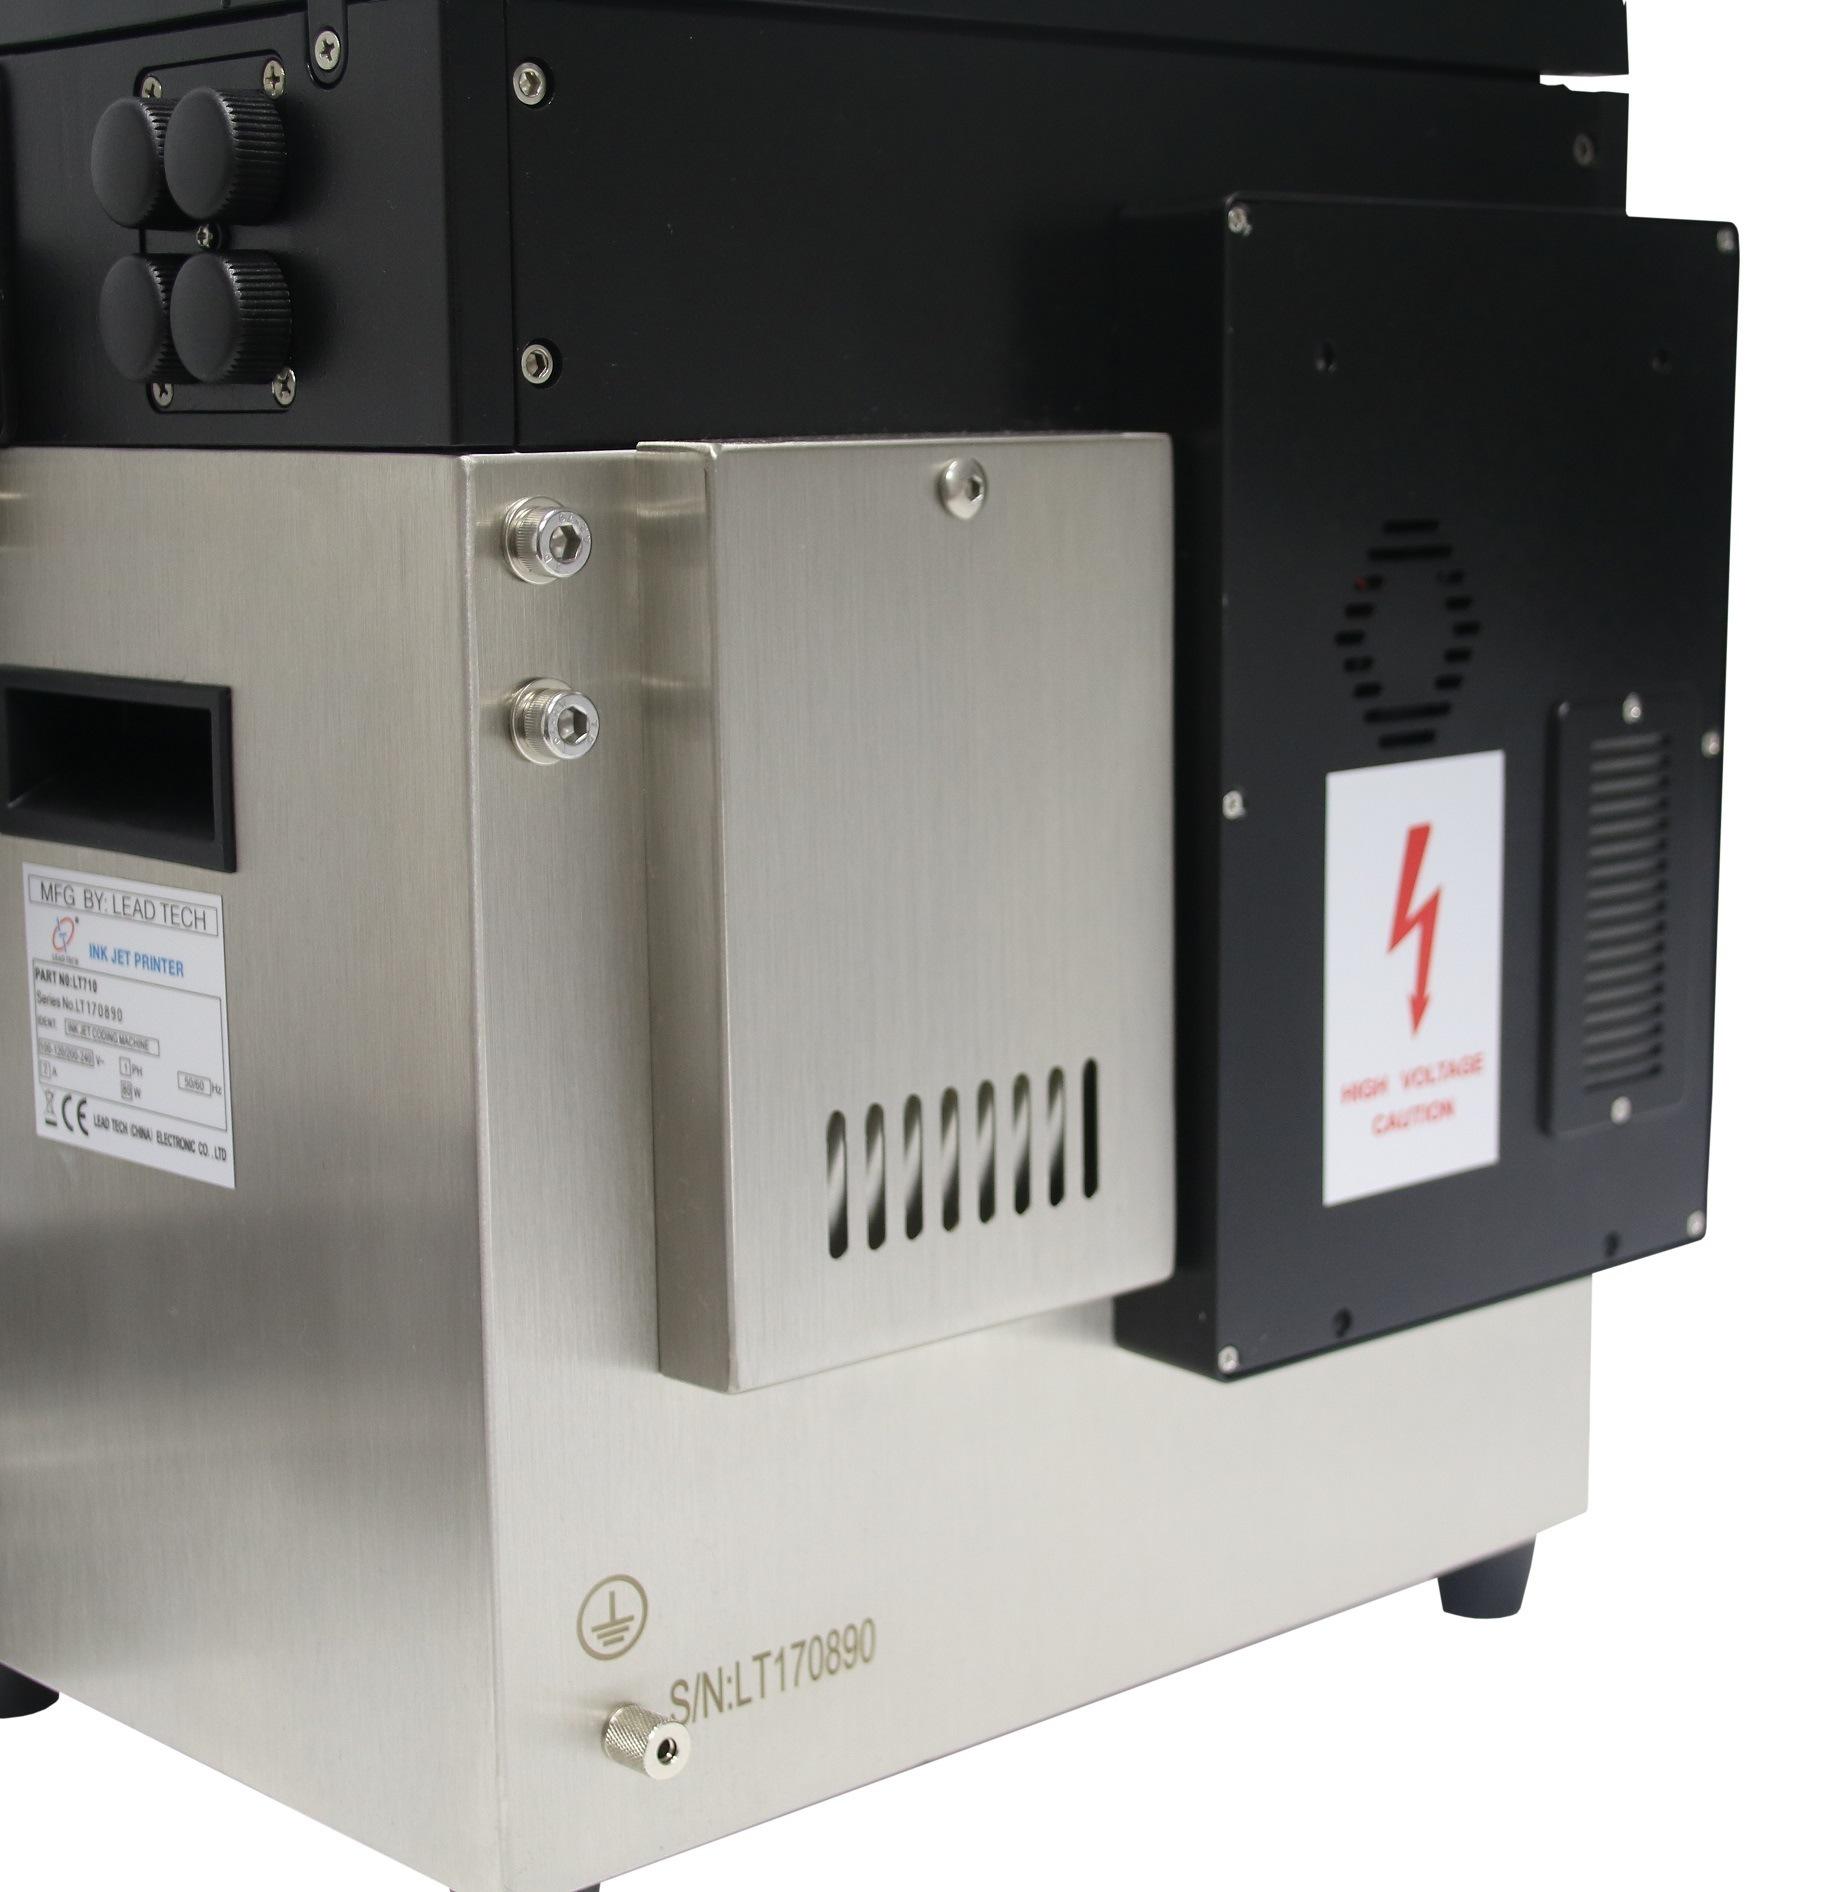 Lead Tech 1d Barcode Continuous Cij Inkjet Printer Lt760